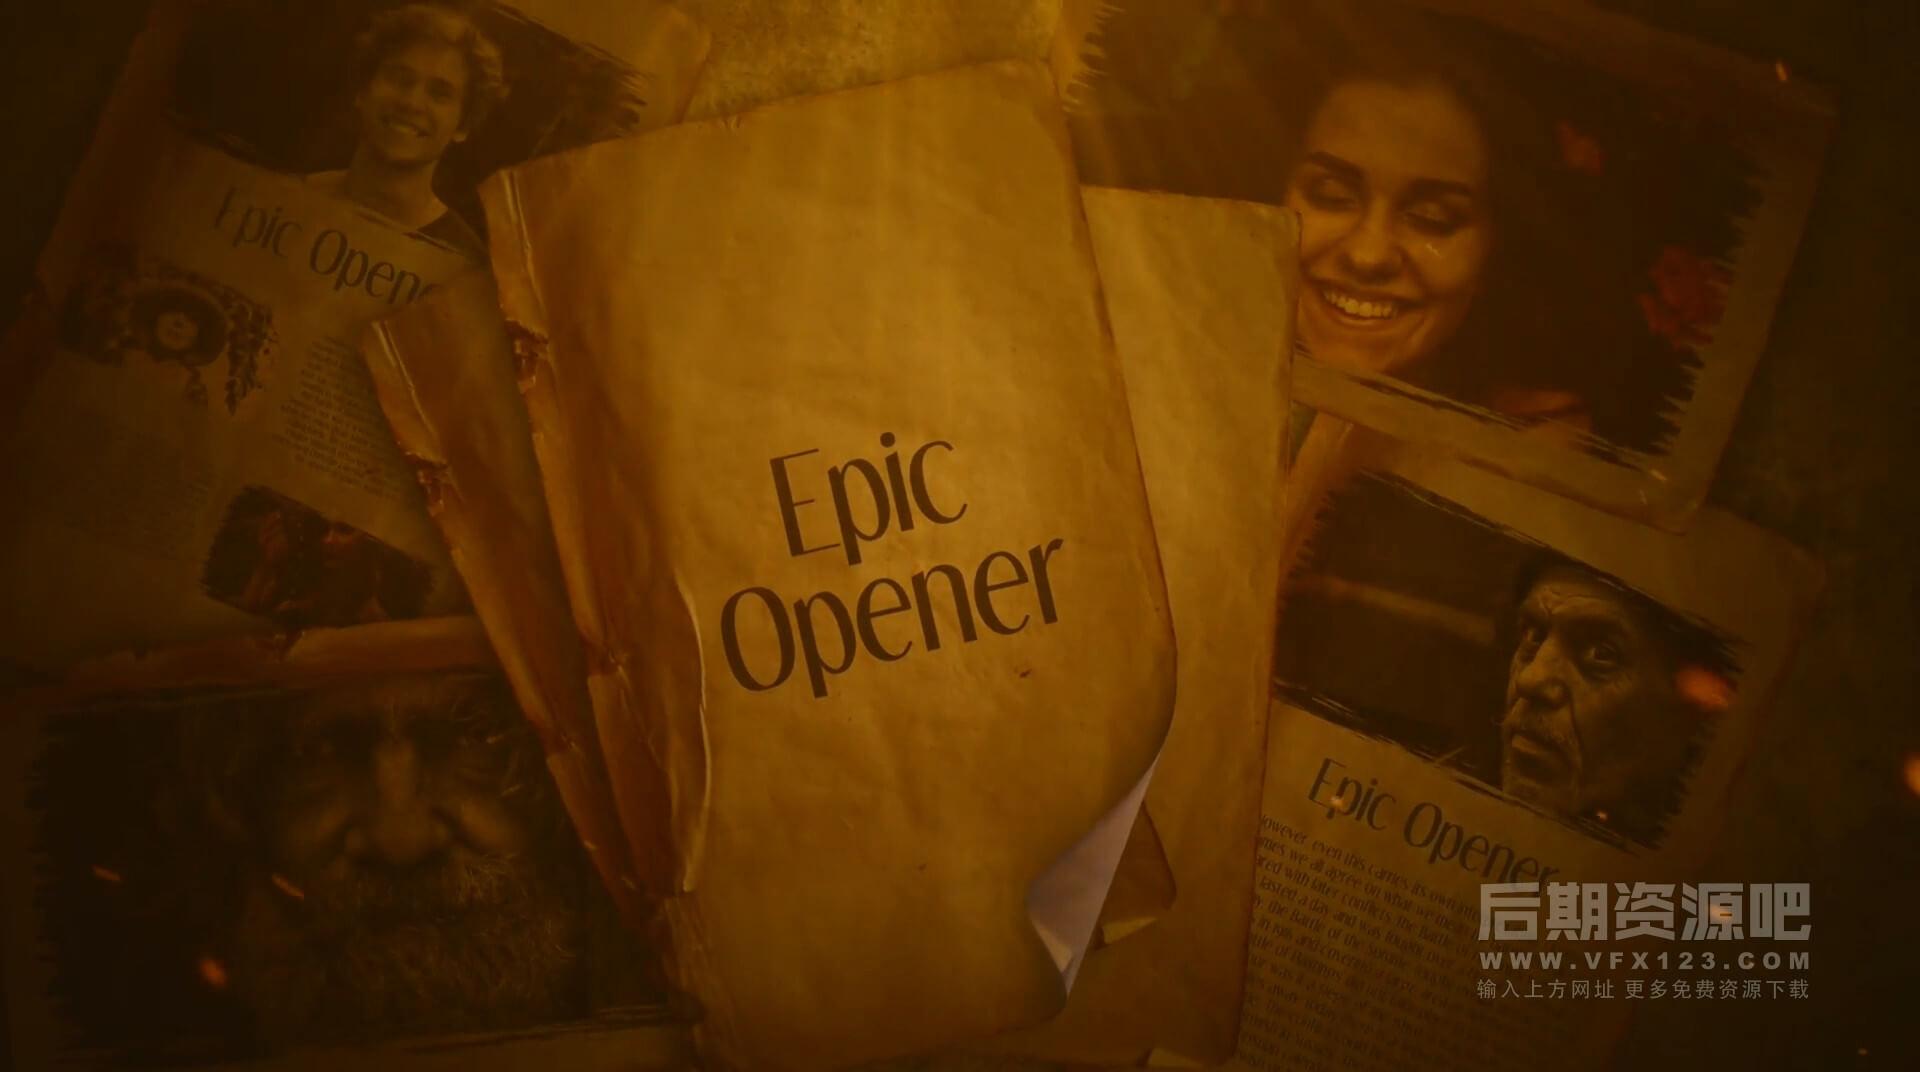 Fcpx主题模板 史诗大片历史回忆录纪念册年会模板 Epic Opener